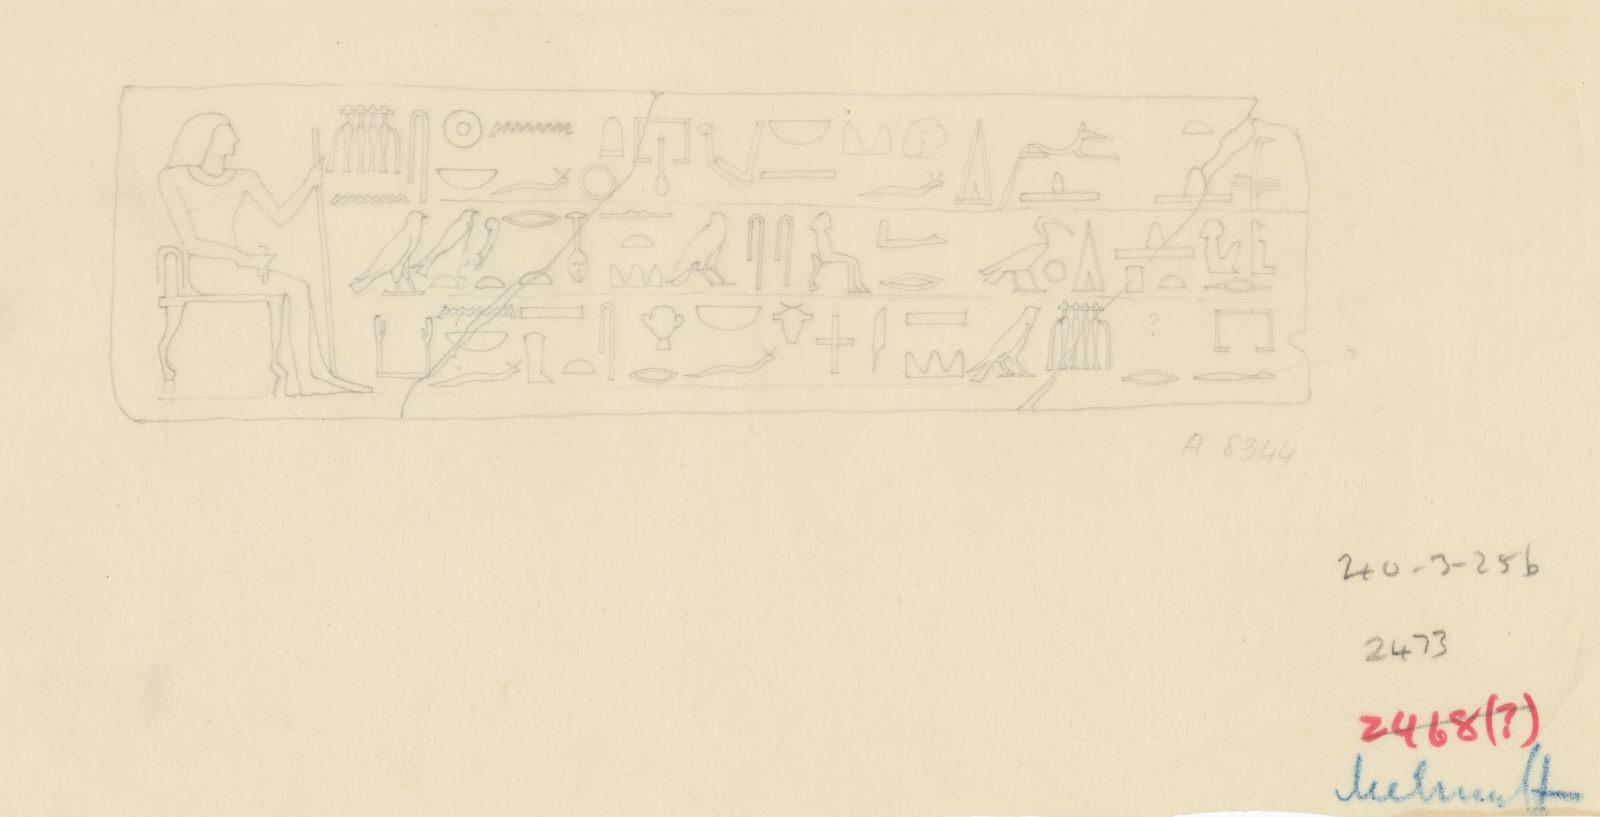 Drawings: G 2473 (N of): relief from lintel from debris